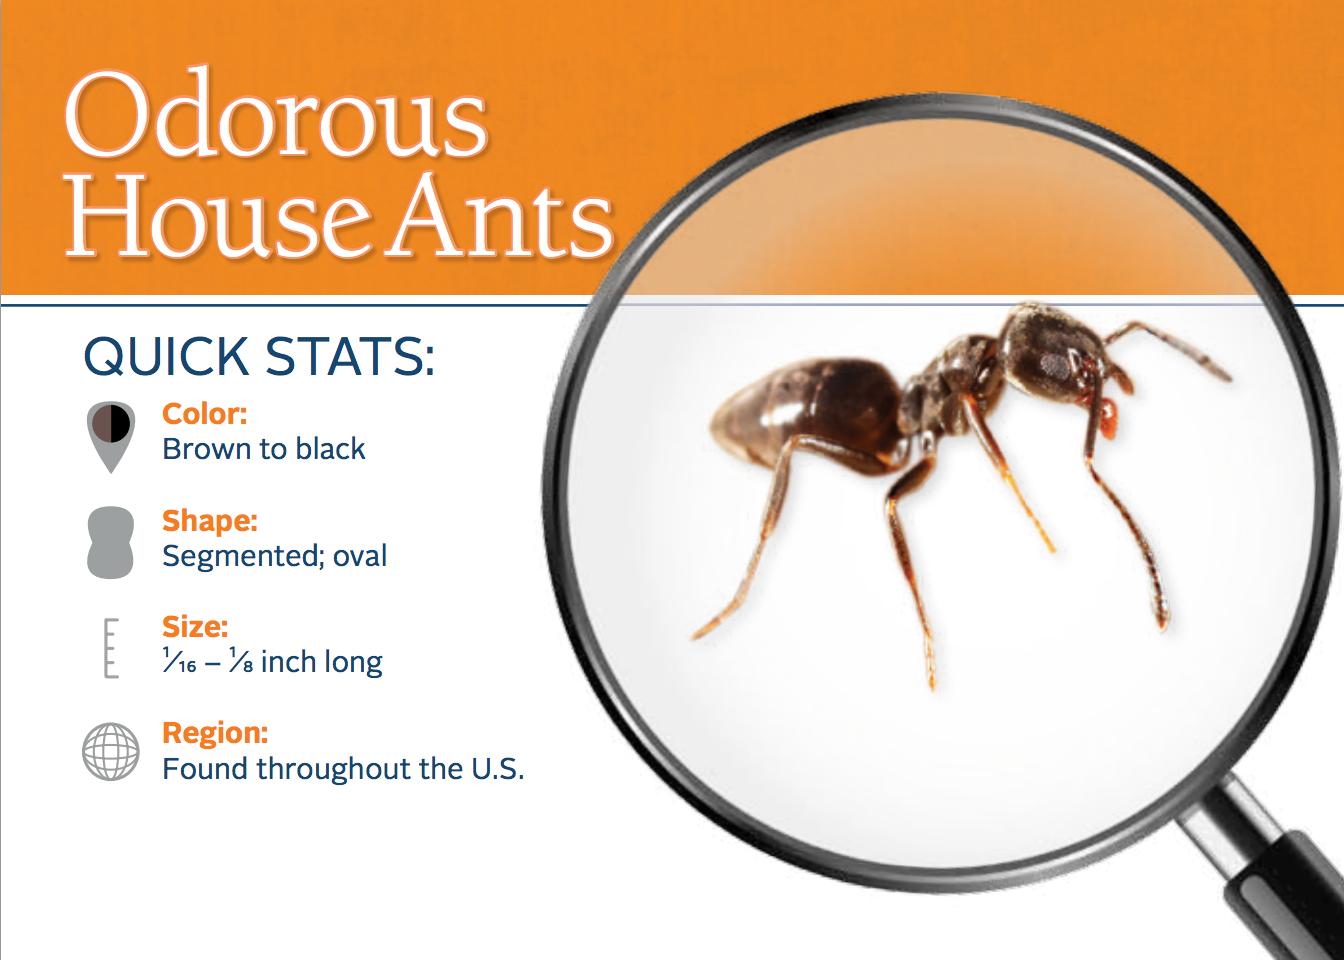 Little Black Ants In Kitchen 25 Best Ideas About Odorous House Ants On Pinterest Ants In